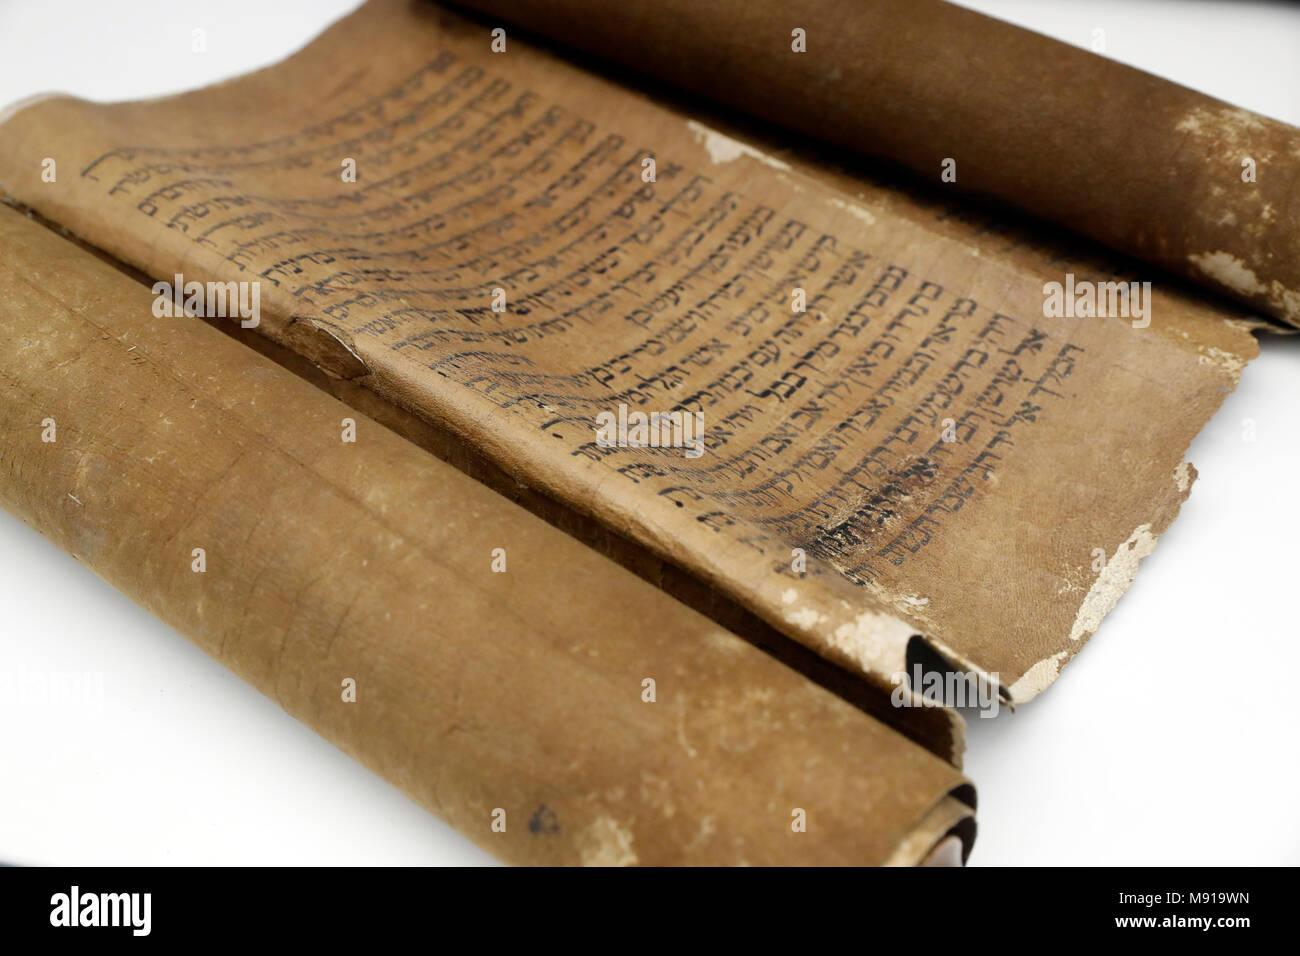 18 Th Century Stock Photos & 18 Th Century Stock Images - Alamy